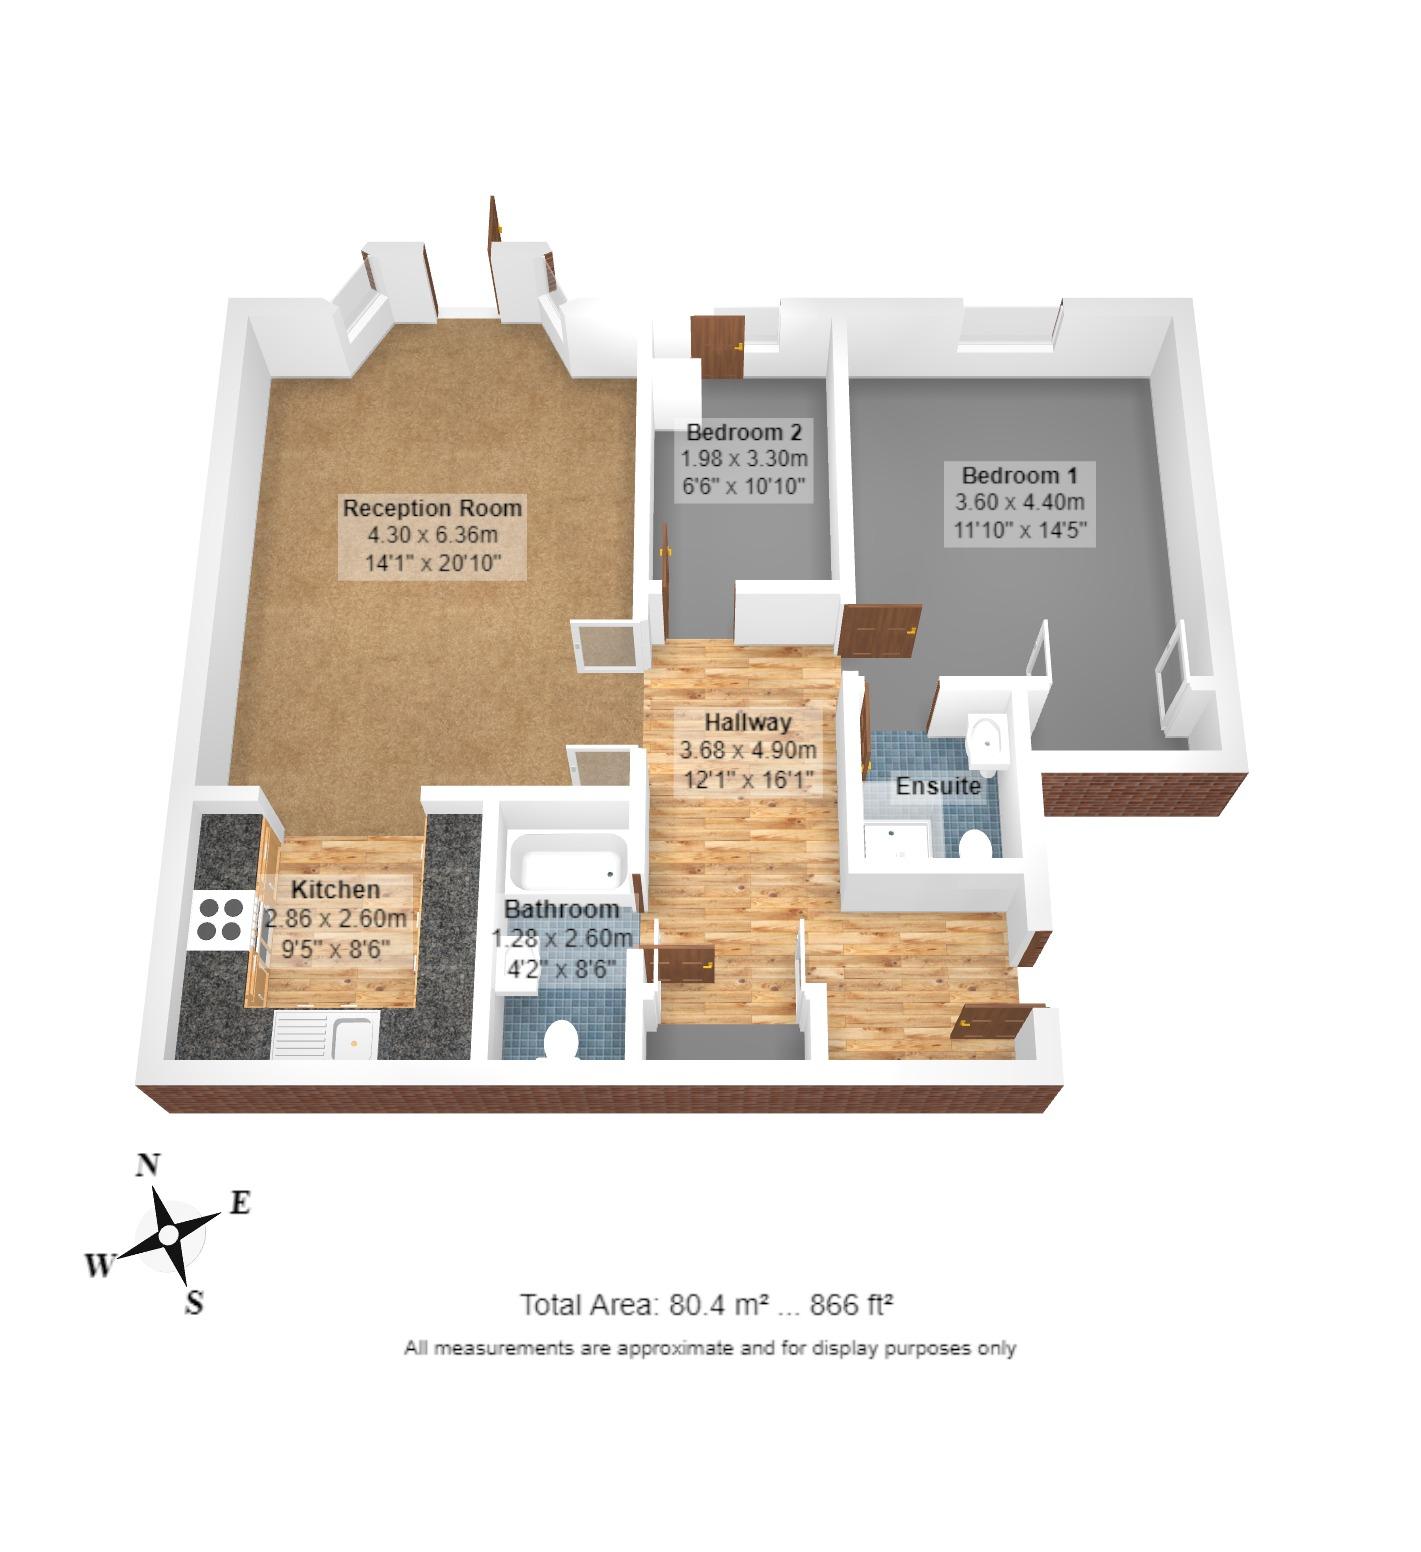 14 Farmery Court Floorplan